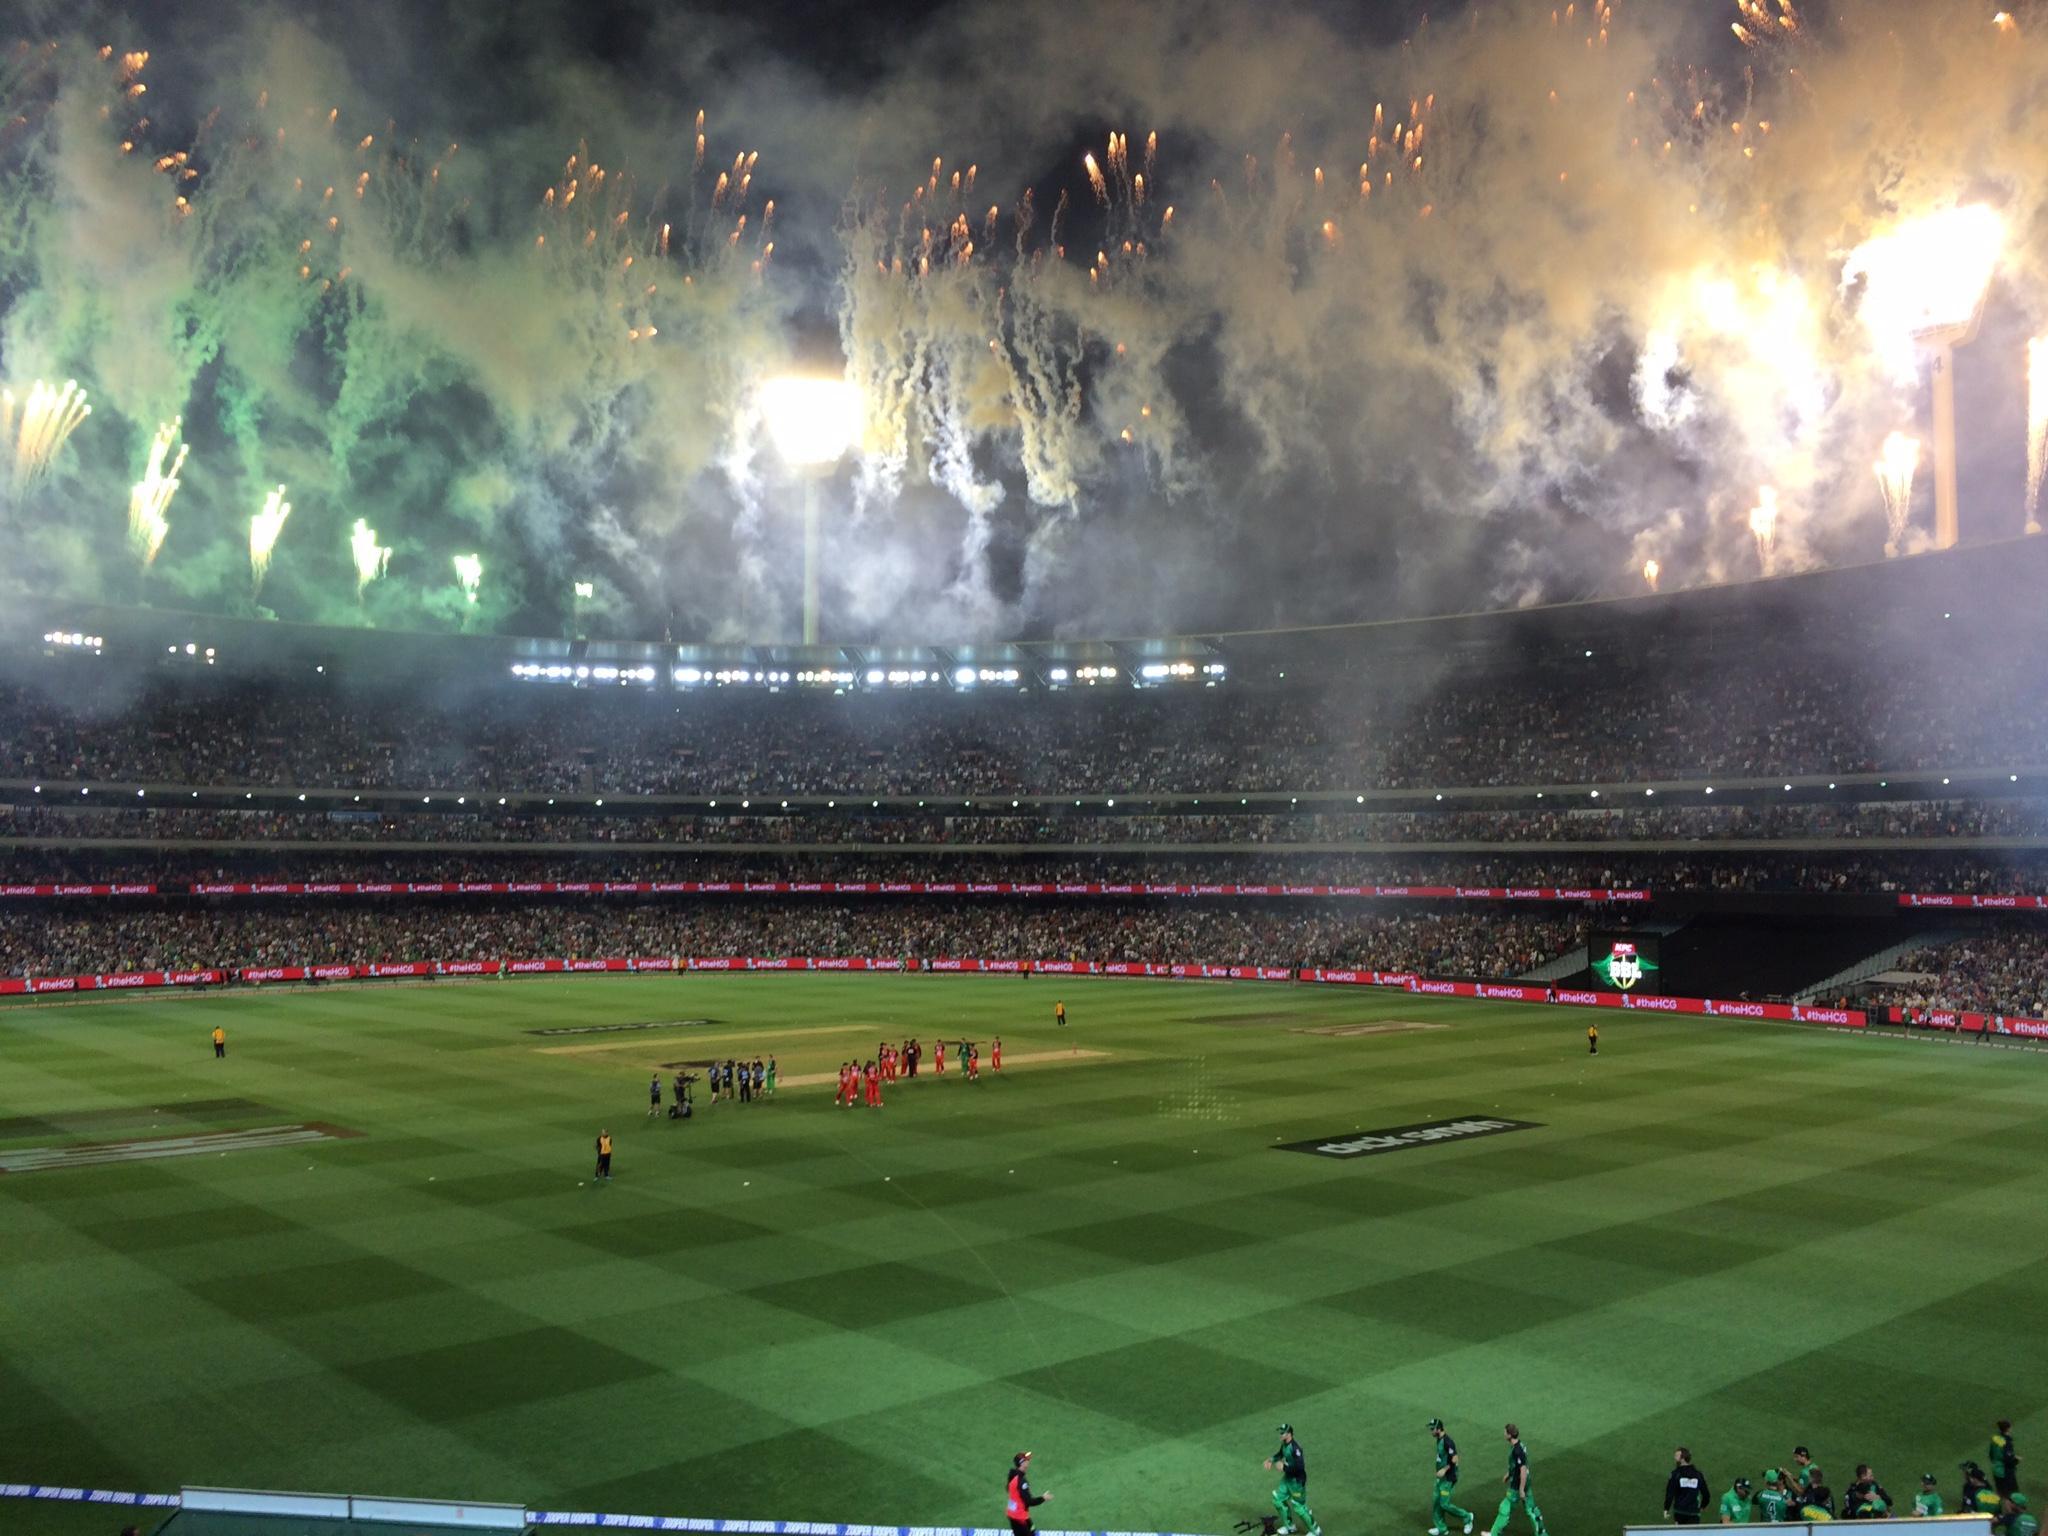 Melbourne Cricket Ground Section Q54